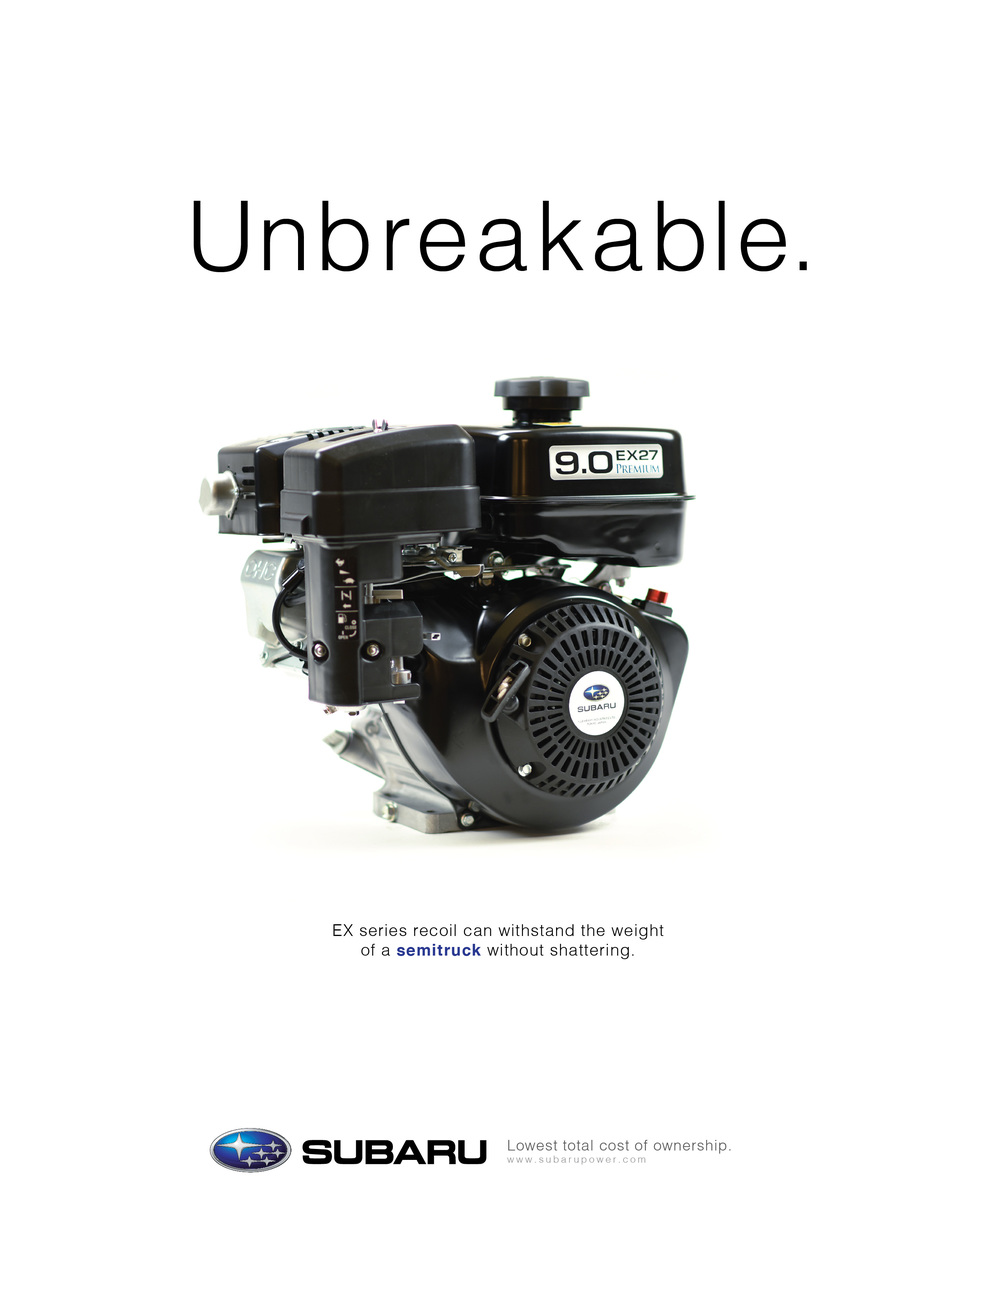 EX27-unbreakable ad-01.jpg